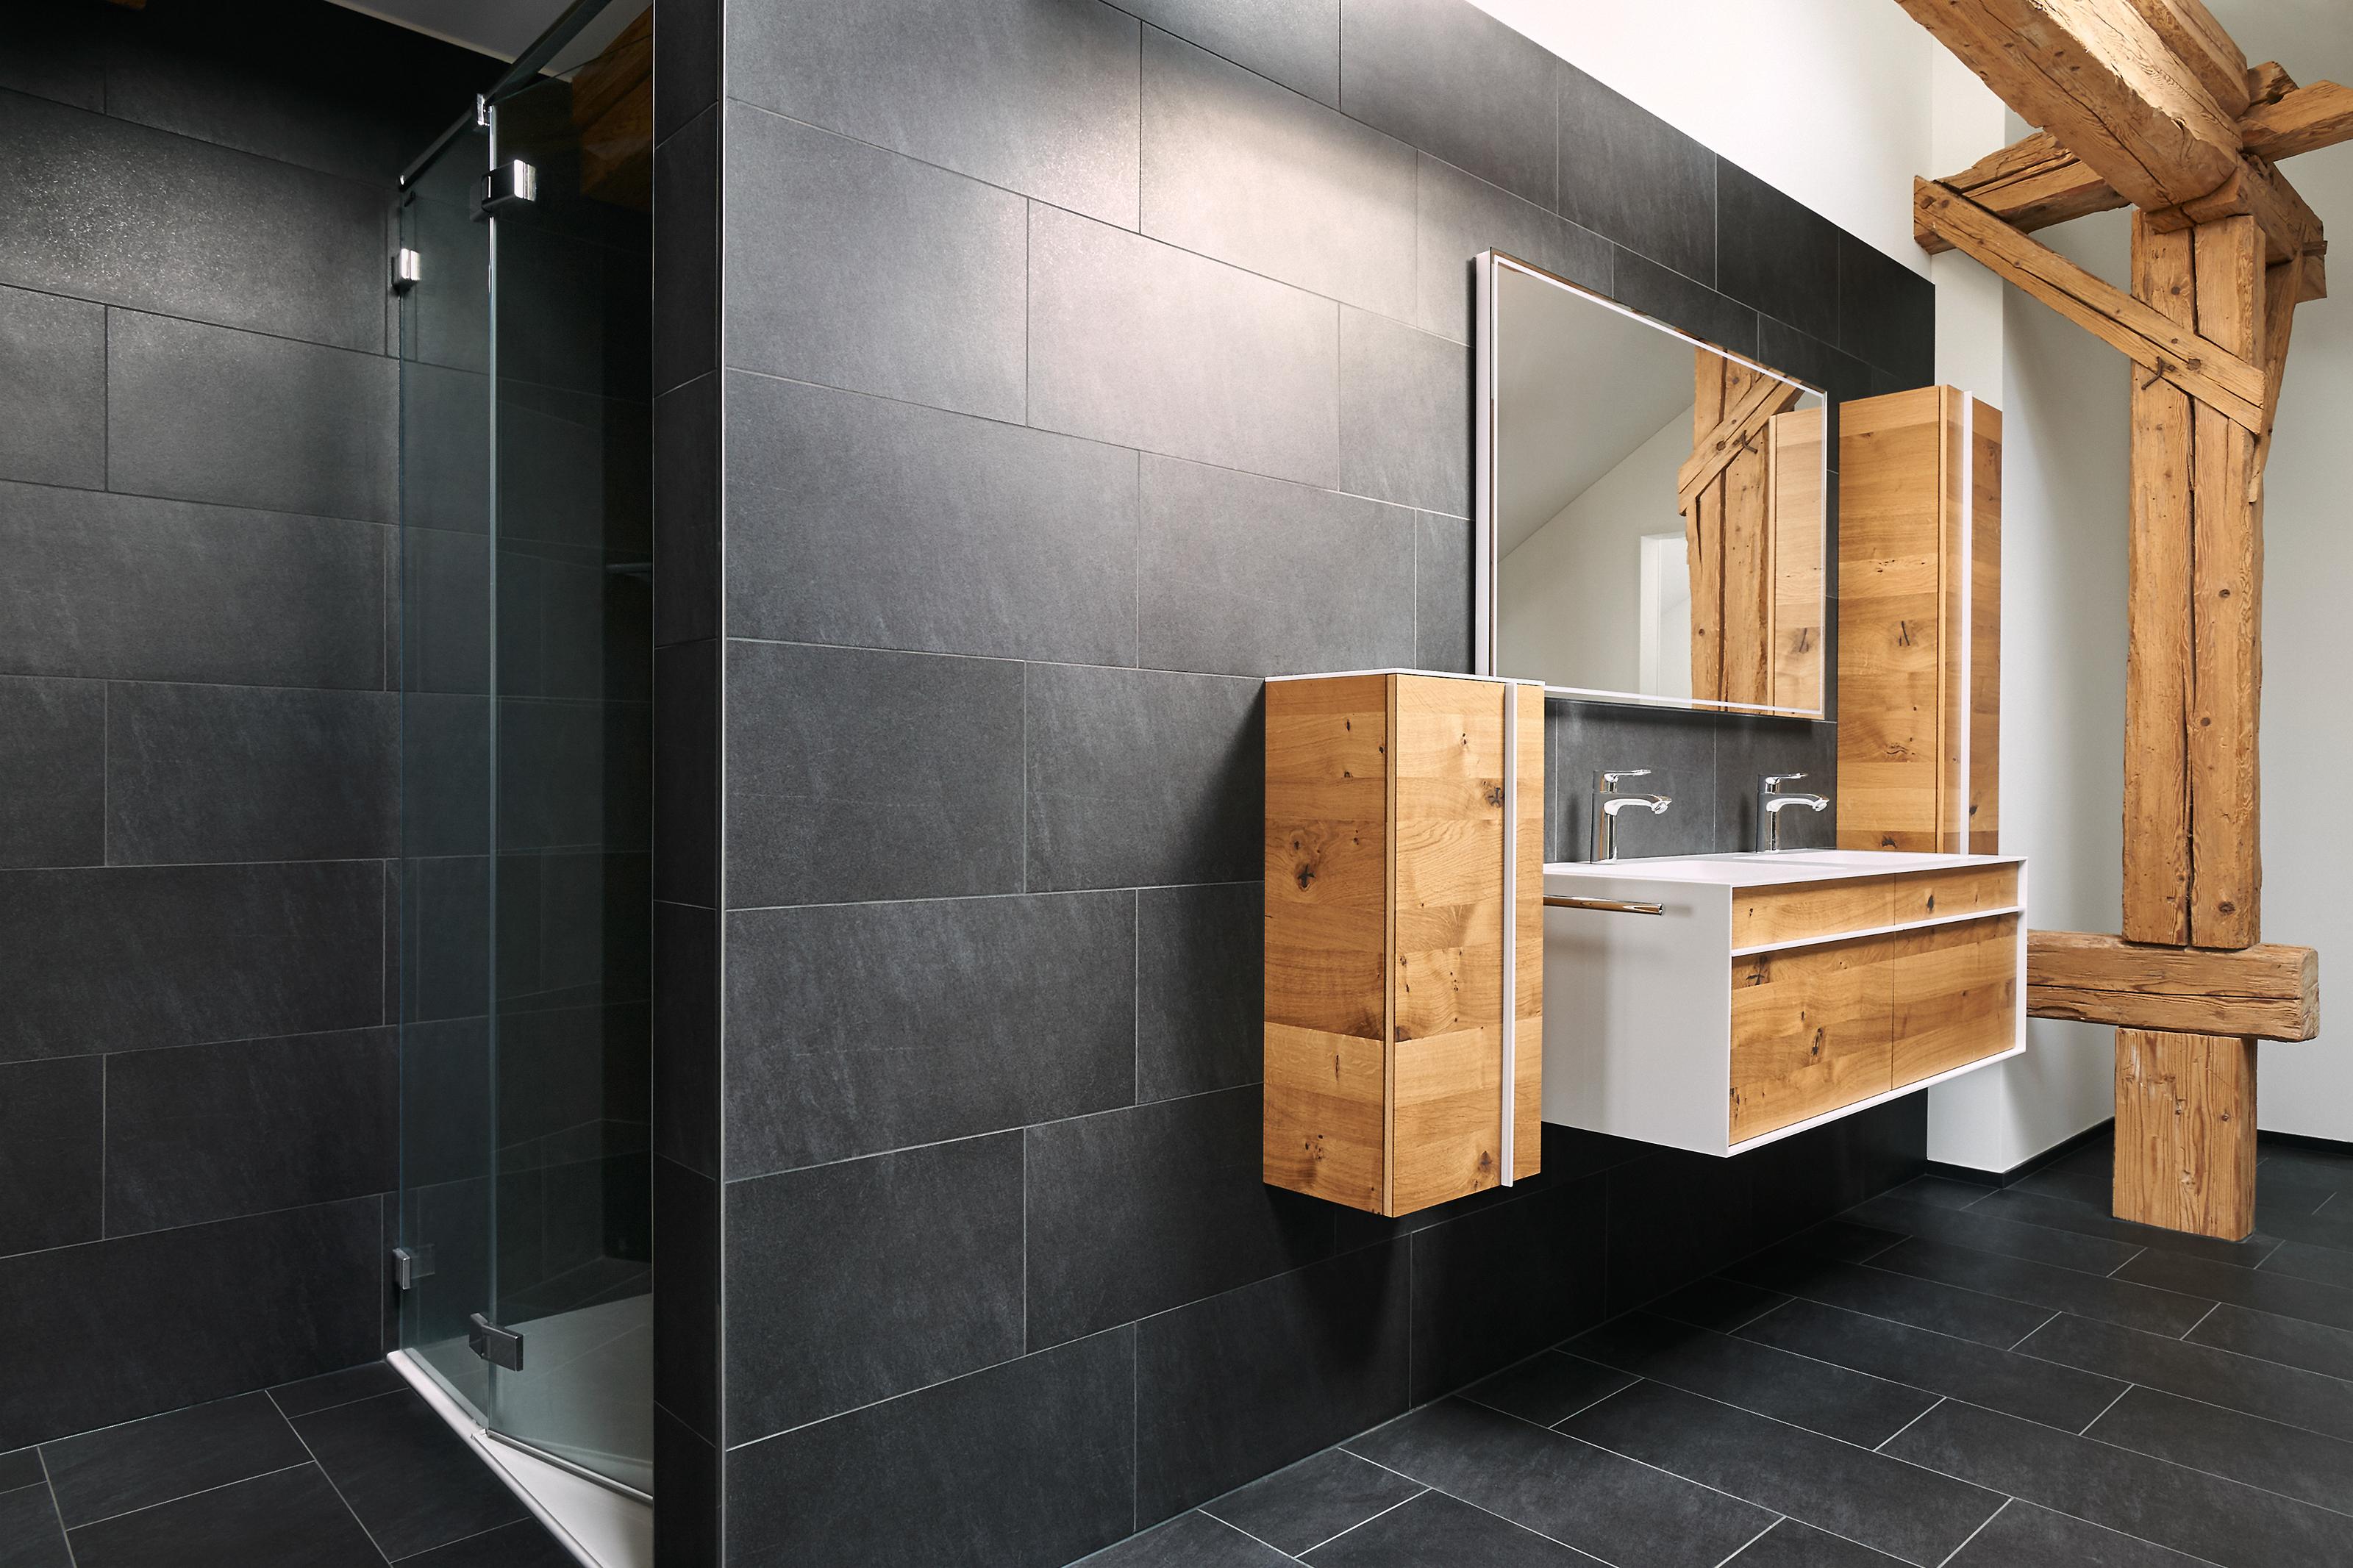 Wandbelag bad best vinyl badezimmer with wandbelag bad for Marmorputz badezimmer